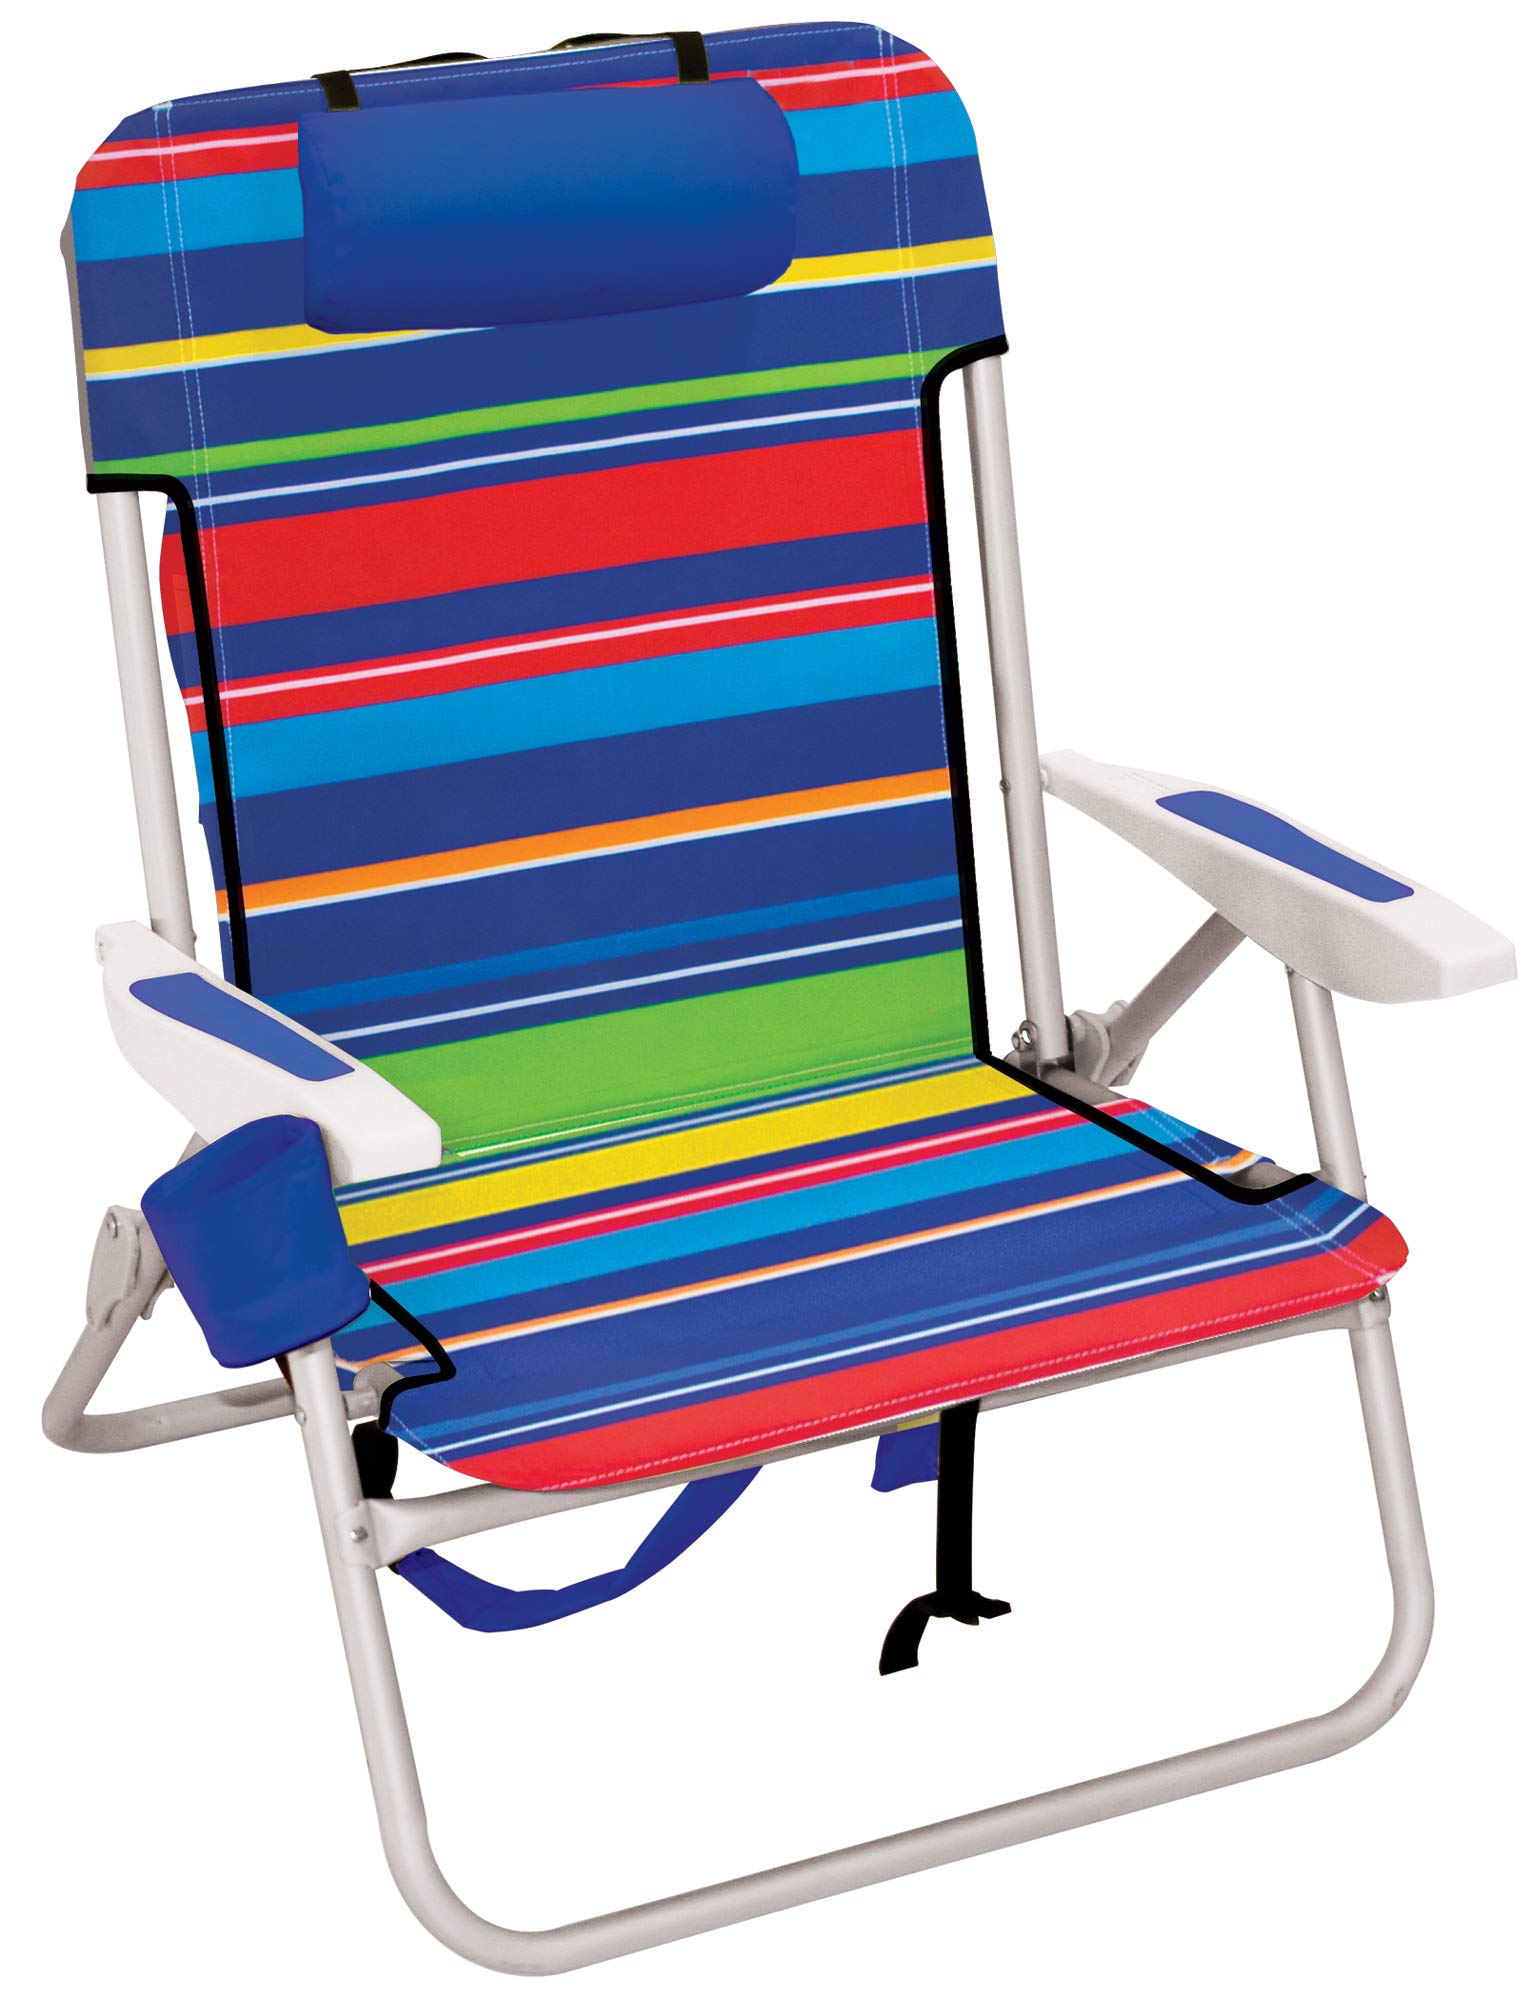 Rio Beach Big Boy Folding 13 Inch High Seat Backpack Beach or Camping Chair